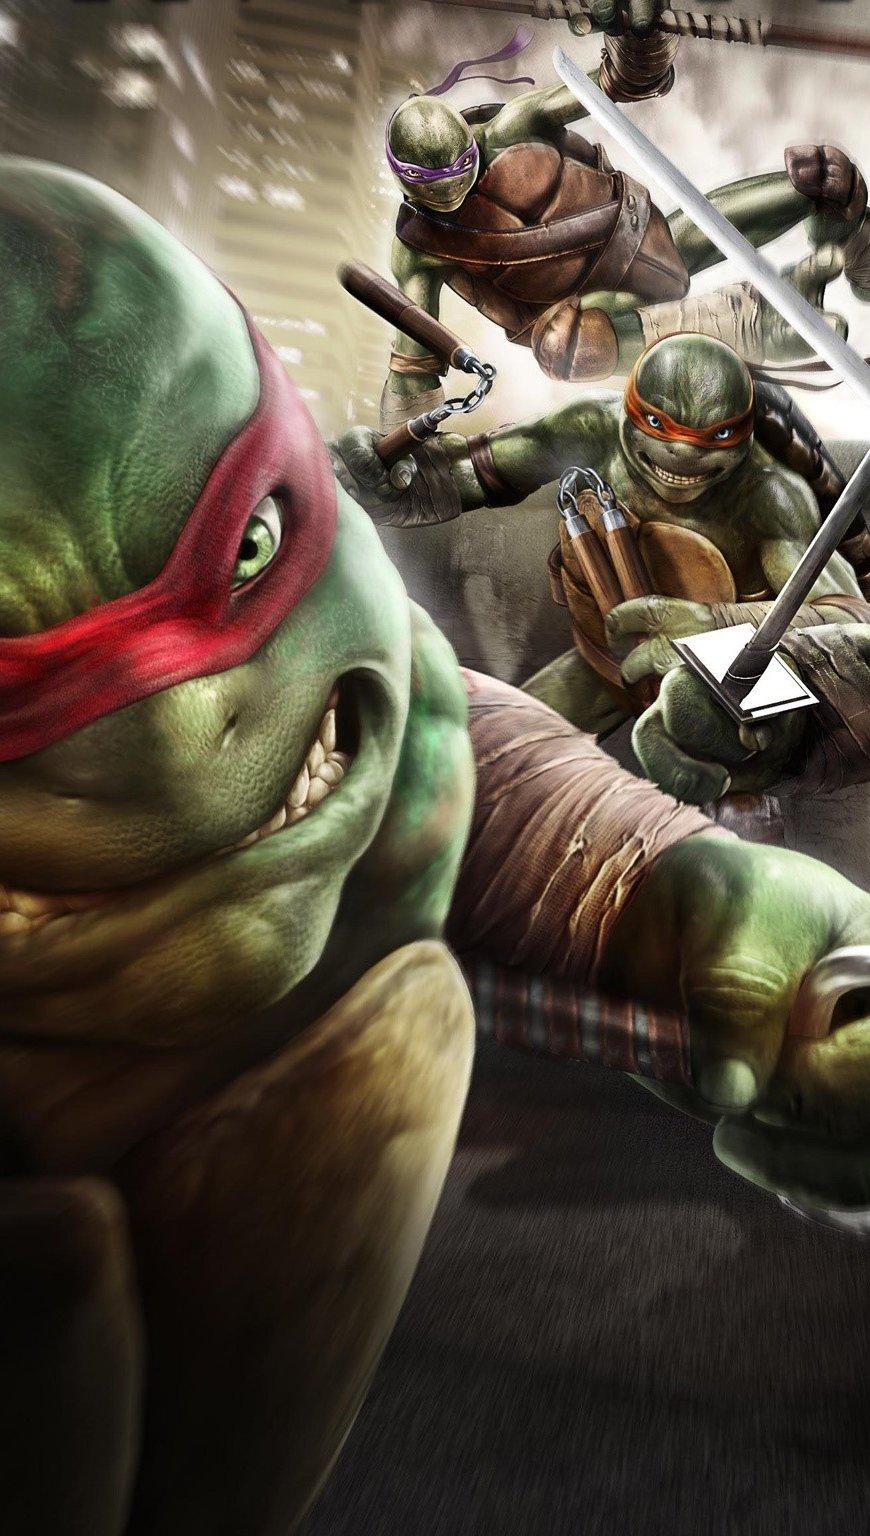 Fondos de pantalla Tortugas Ninja Vertical